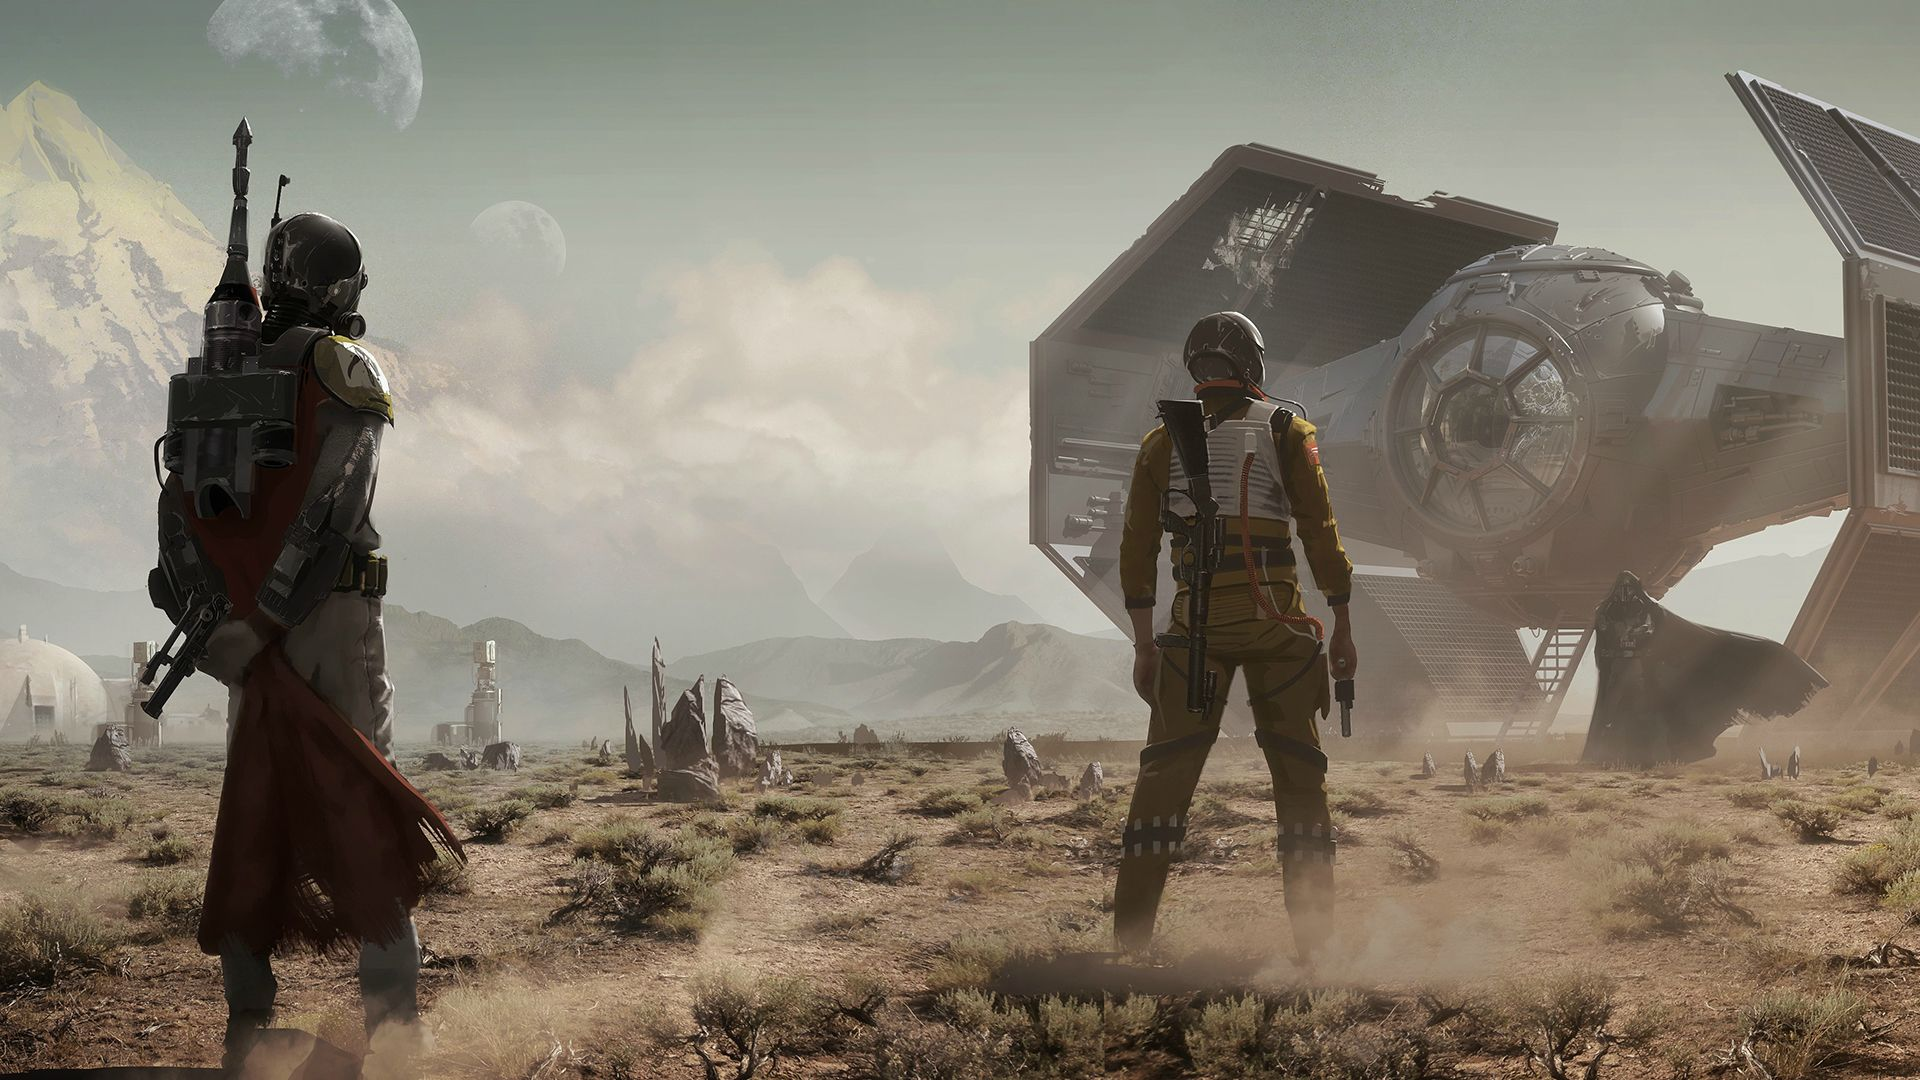 My ultimate wallpaper dump 140+ HD Star Wars Wallpapers for